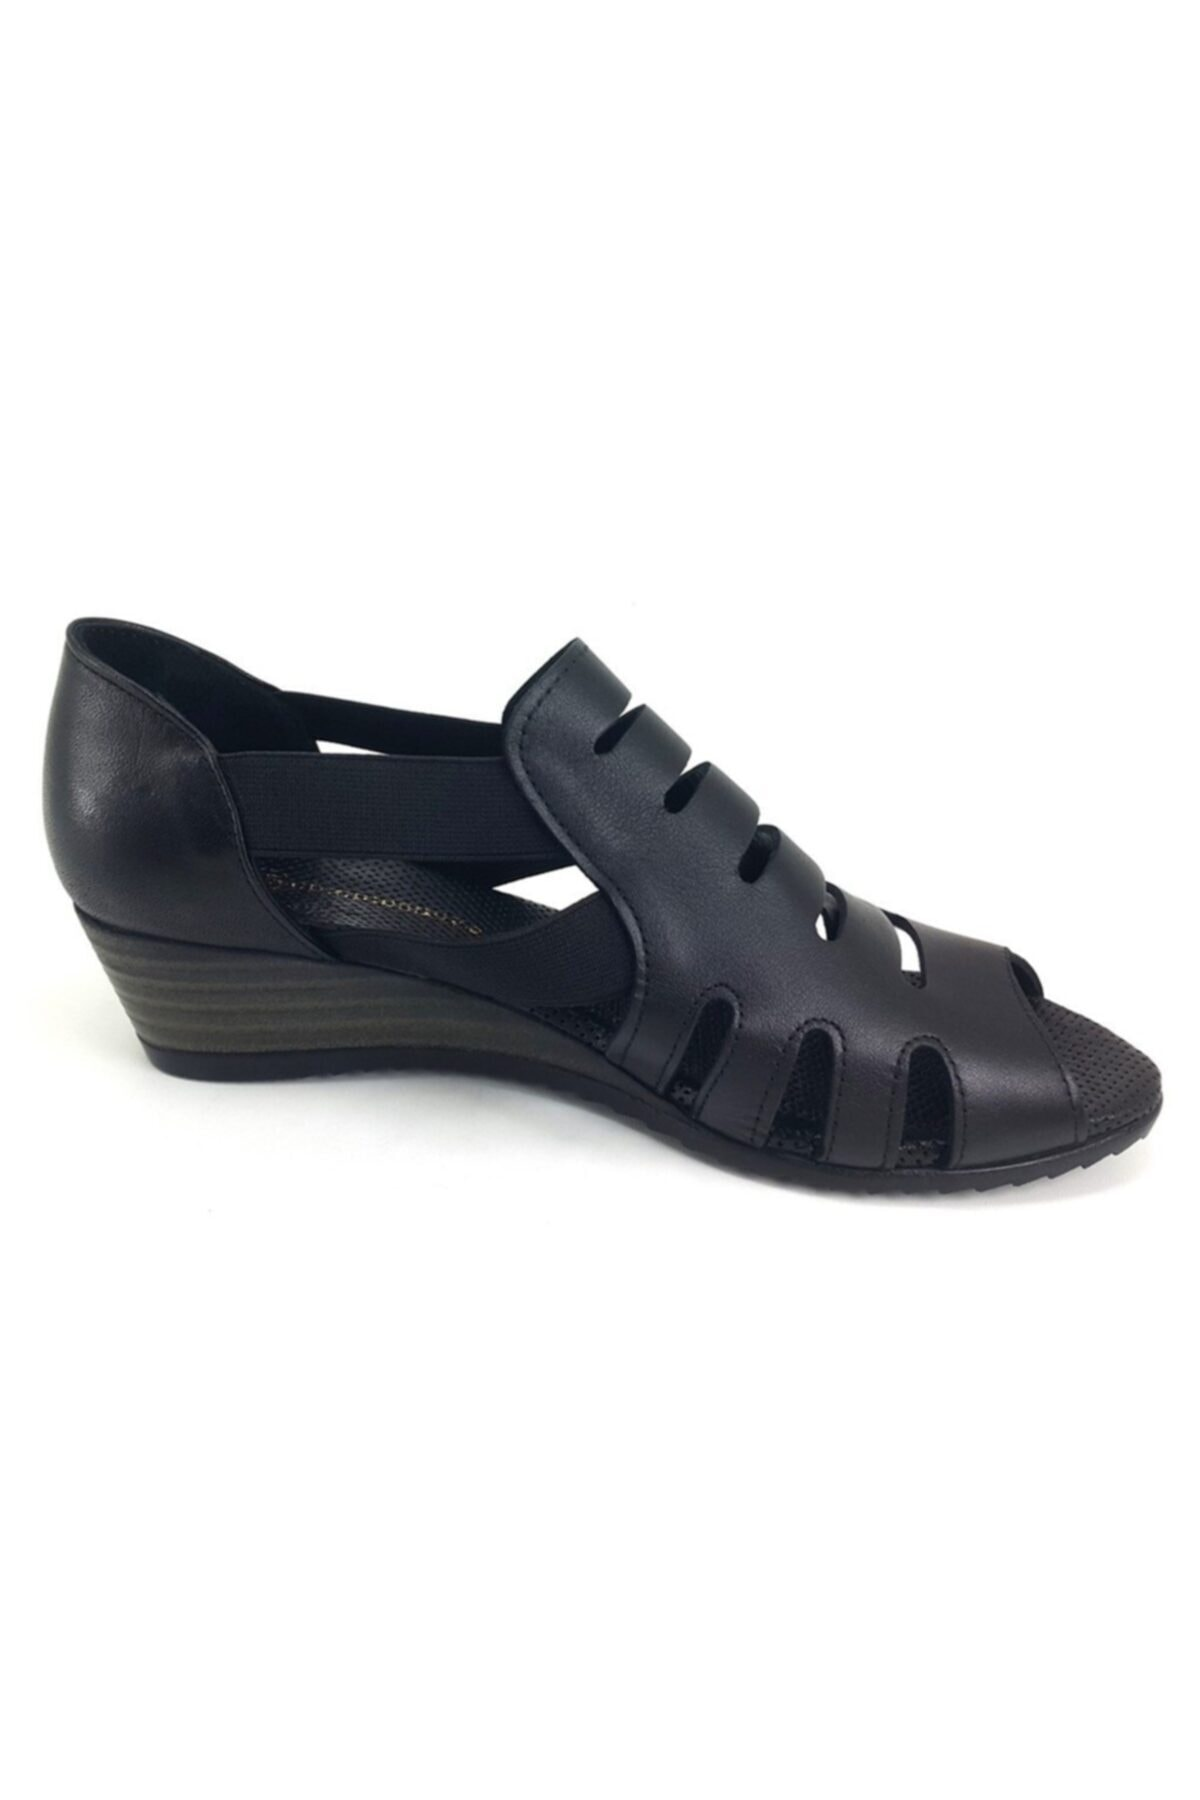 Mammamia Kadın Siyah Dolgu Topuklu Sandalet 2